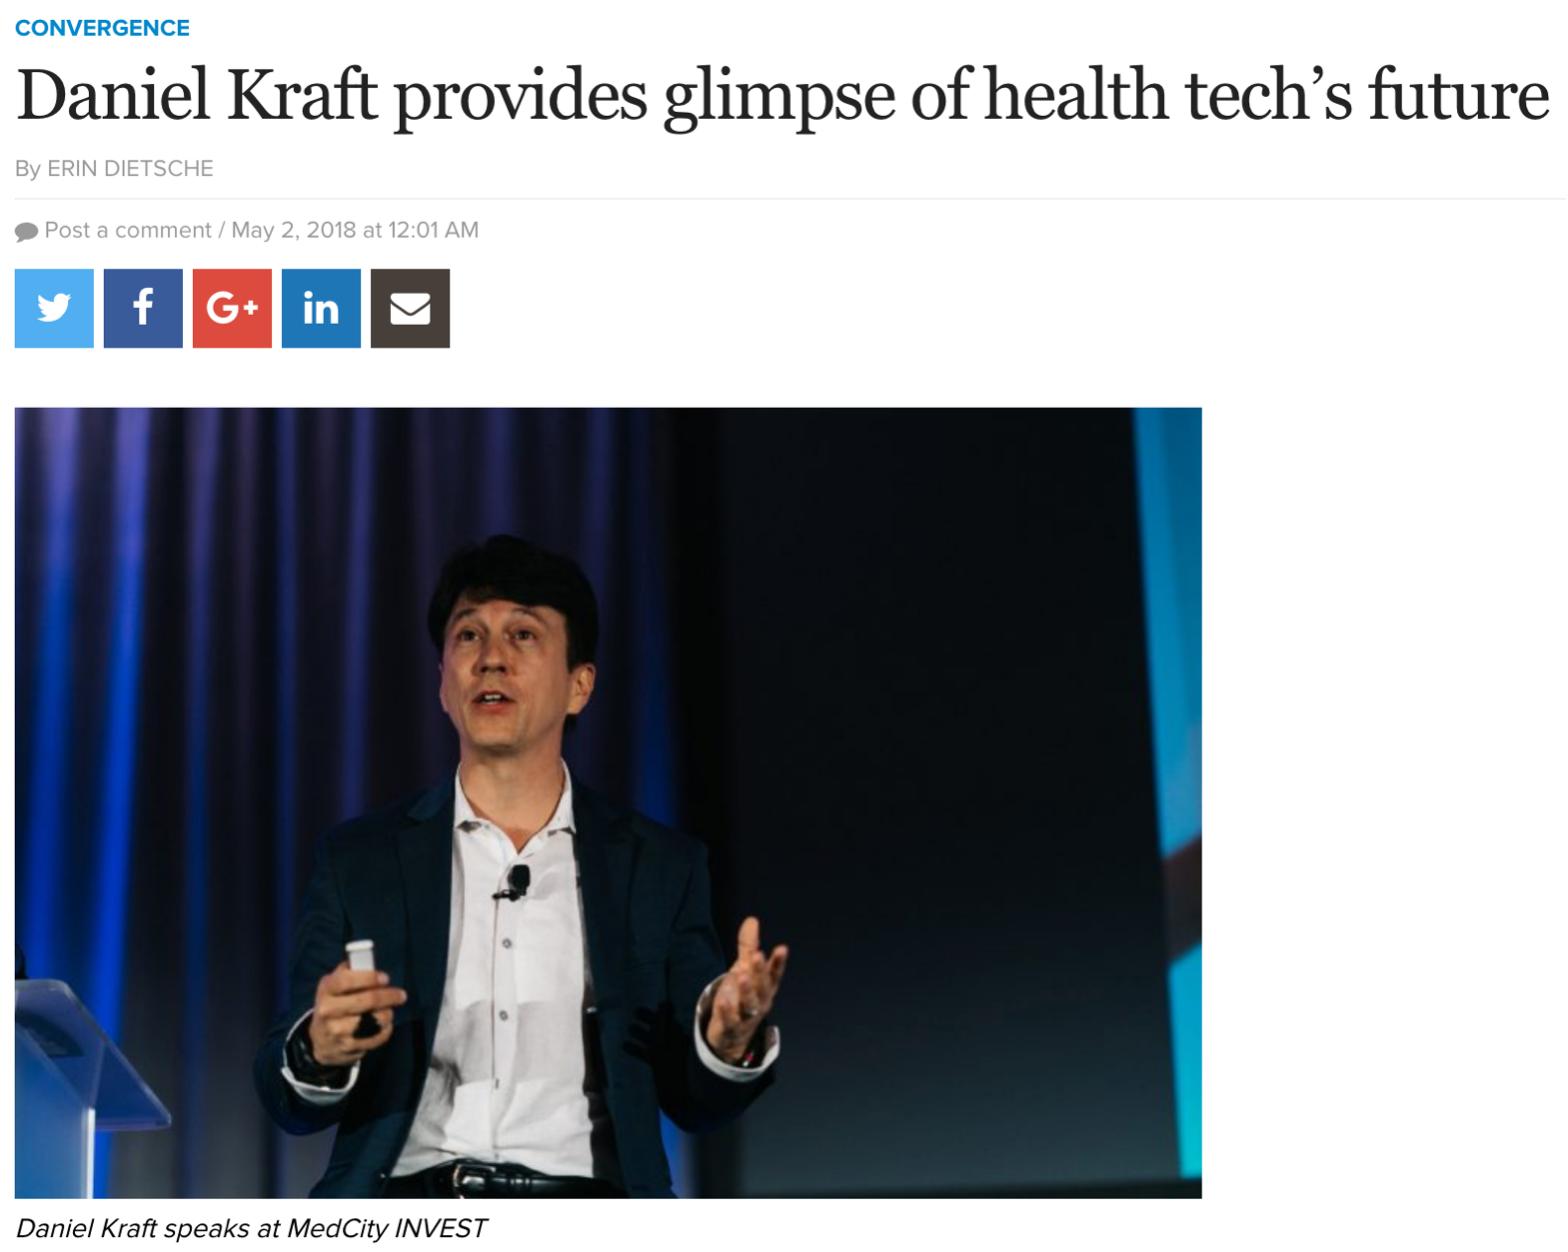 Daniel Kraft speaking at MedCity Invest